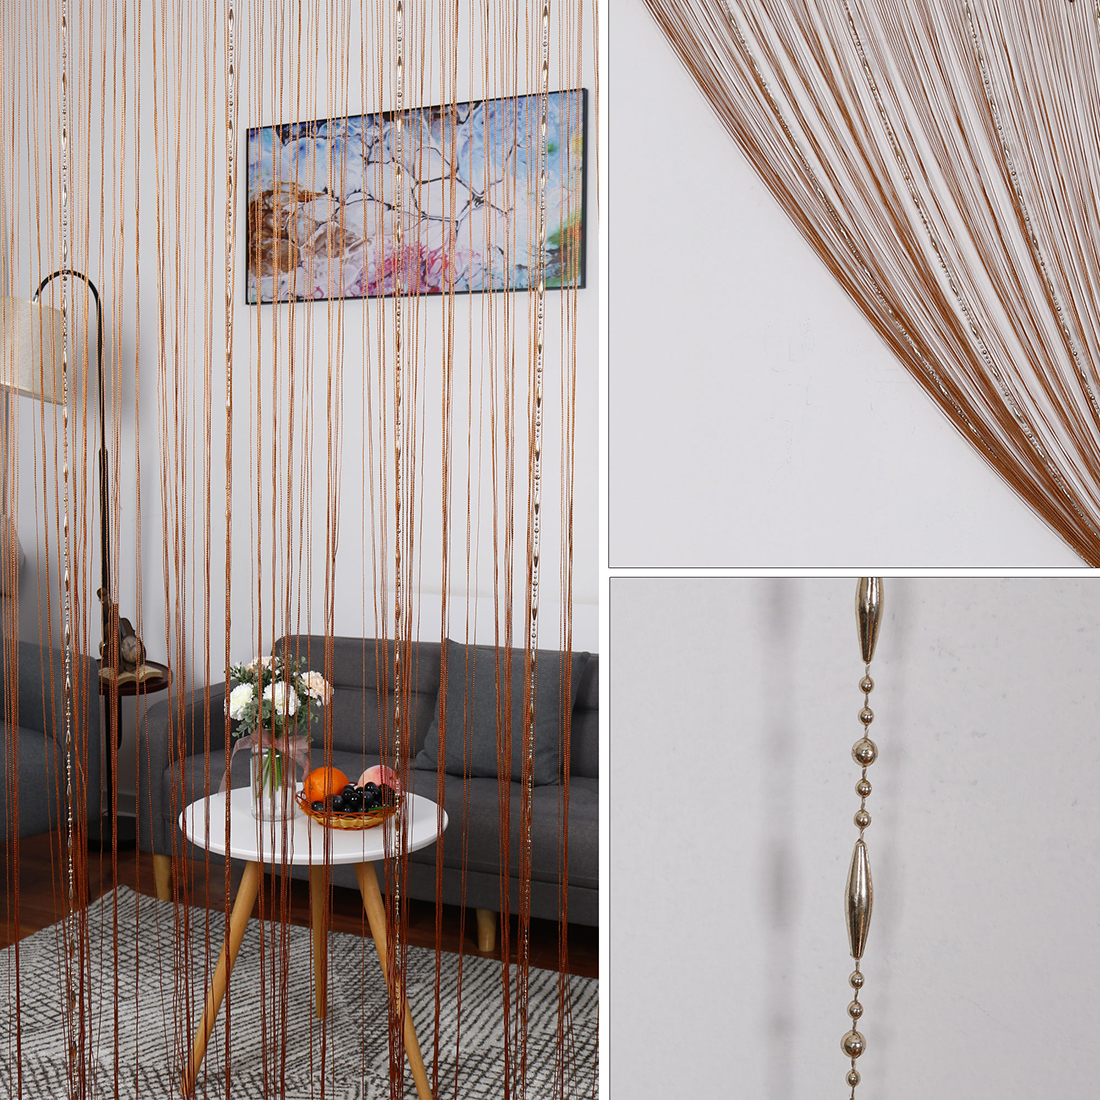 Room Divider Chain String Curtains Window Door Polyester Tassel